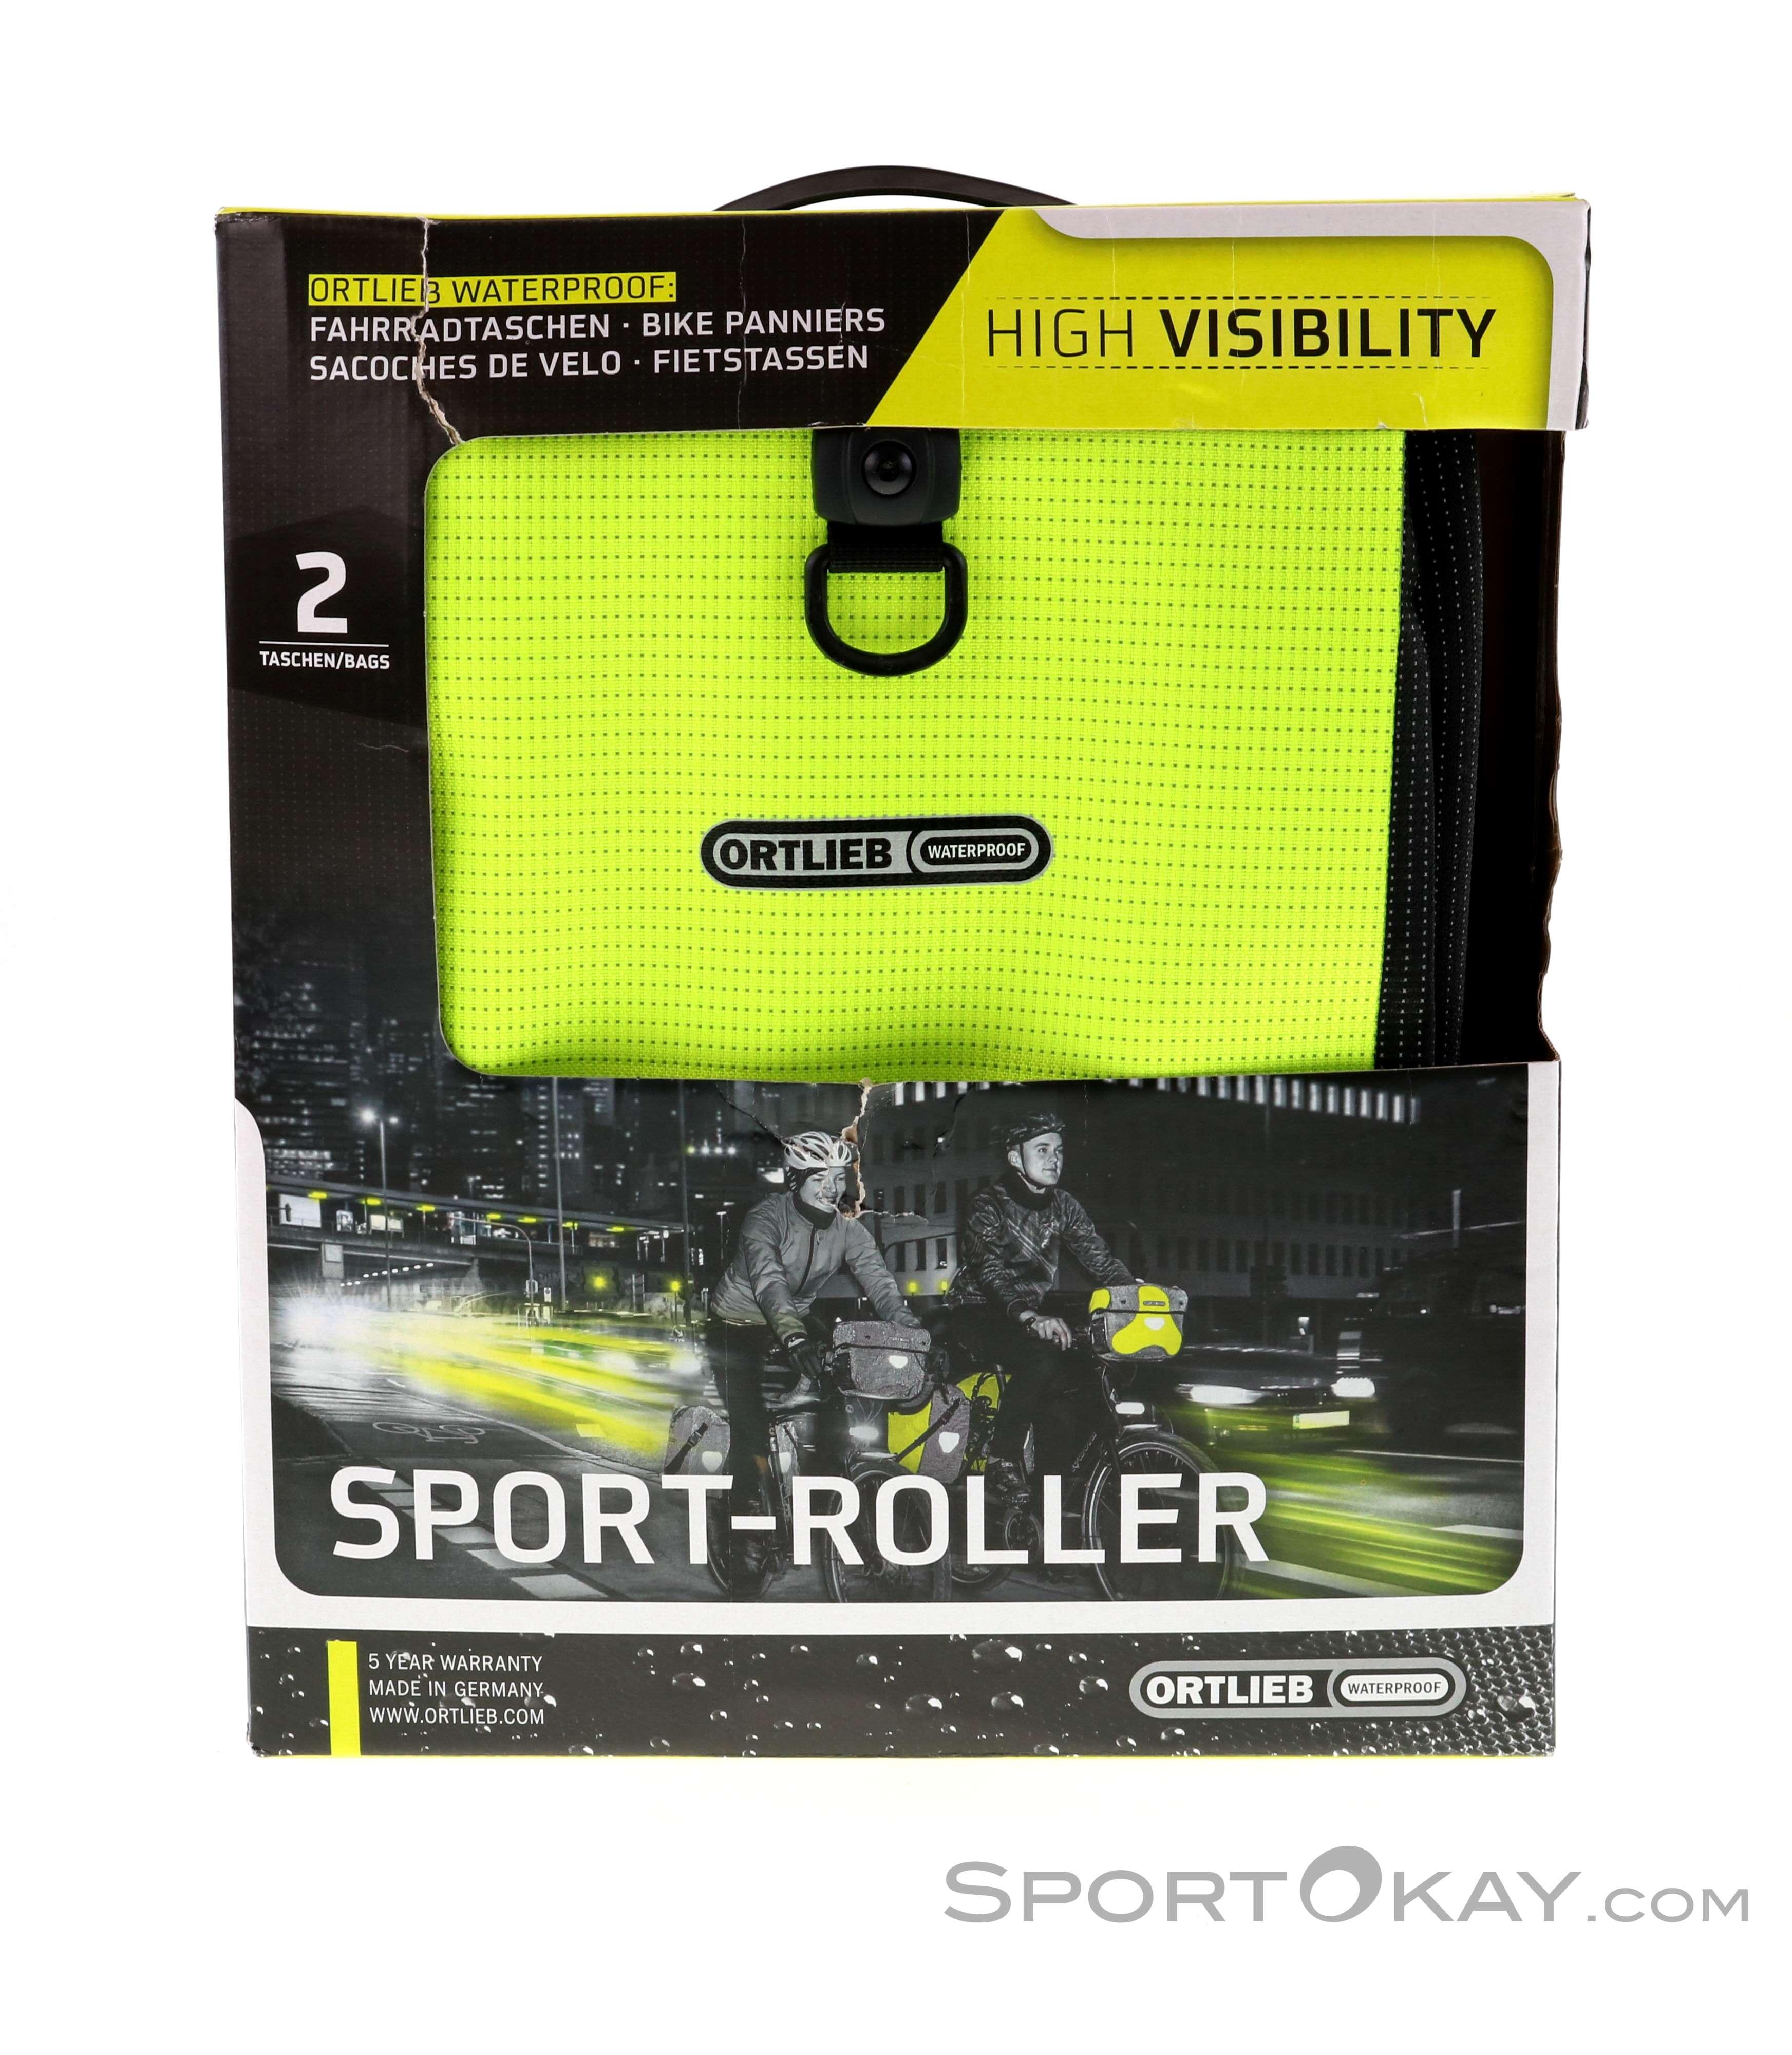 Ortlieb Ortlieb Sport Roller High Visibility 12,5l Fahrradtasche